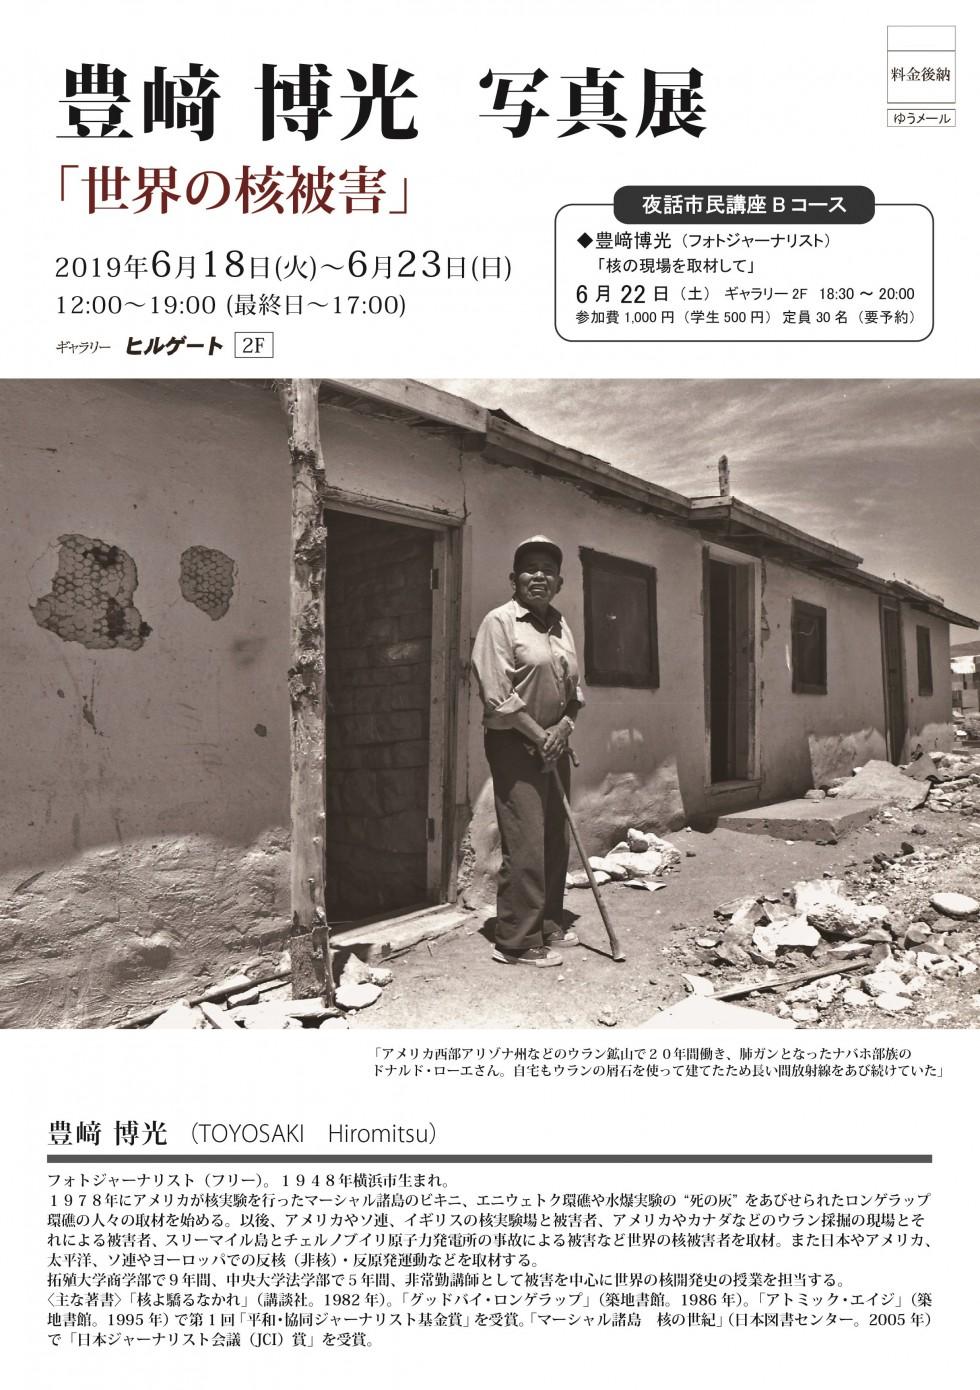 Toyosaki Hiromitsu Photo Exhibition